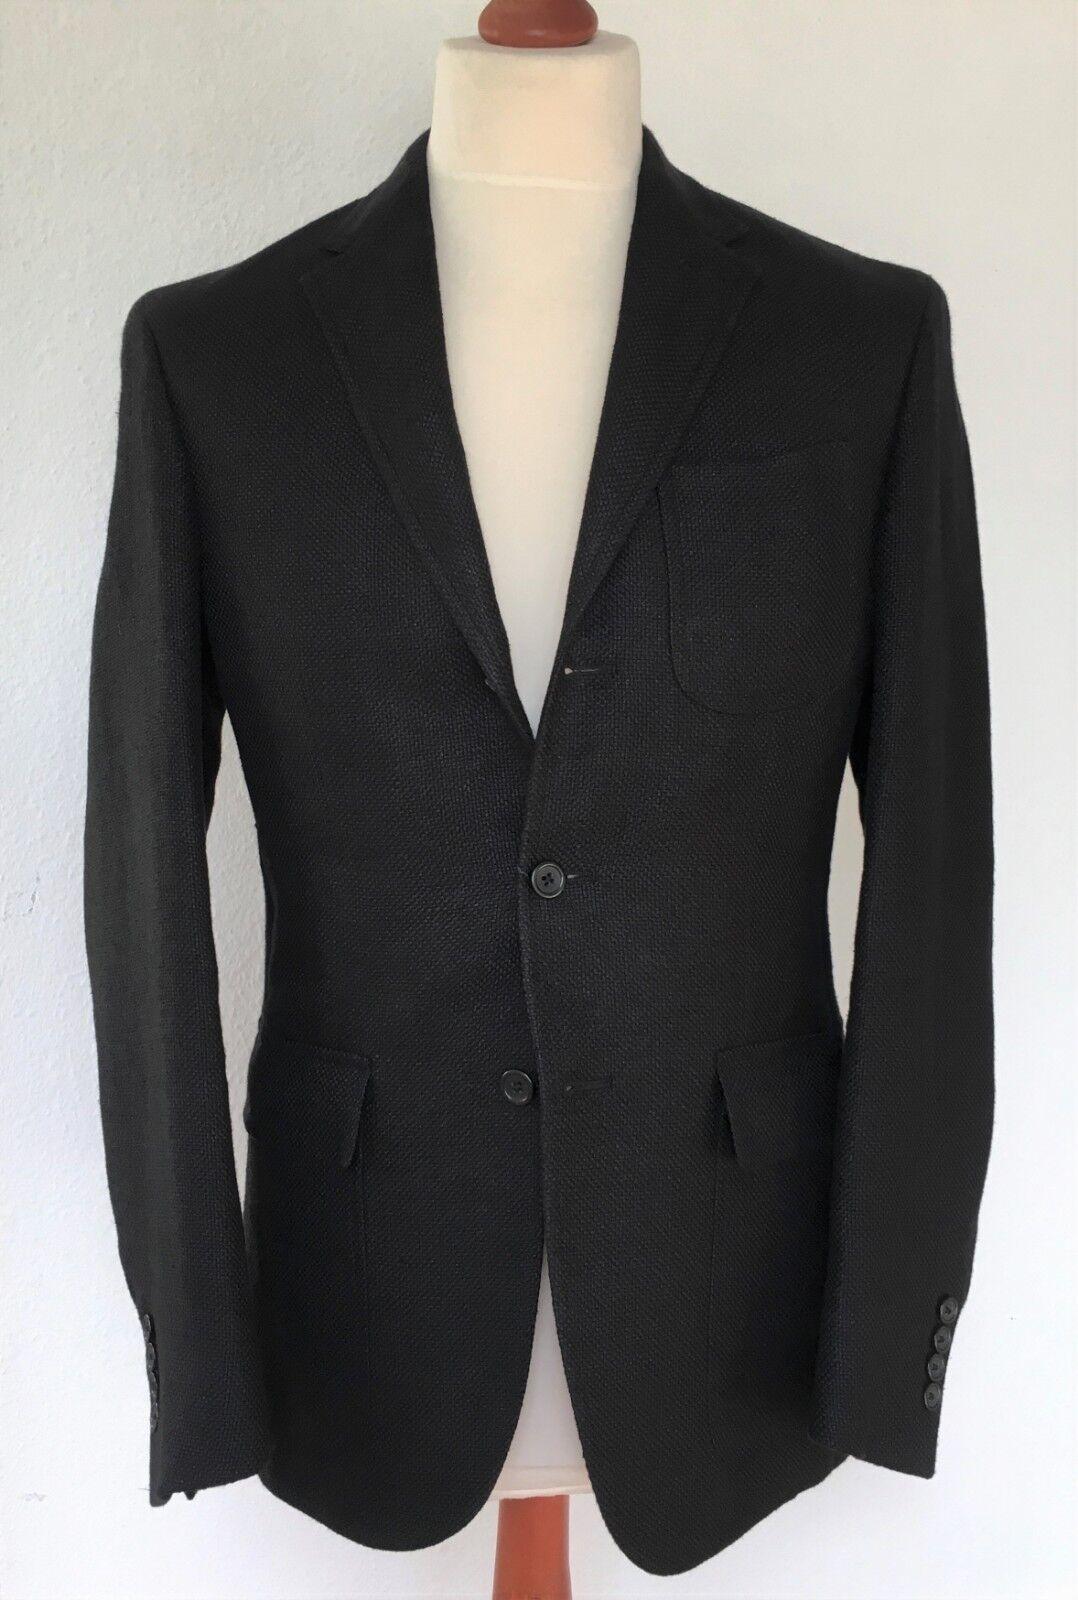 Polo Ralph Lauren, Sakko, schwarz, Leinen/Seide, 48 (US 38R), neu